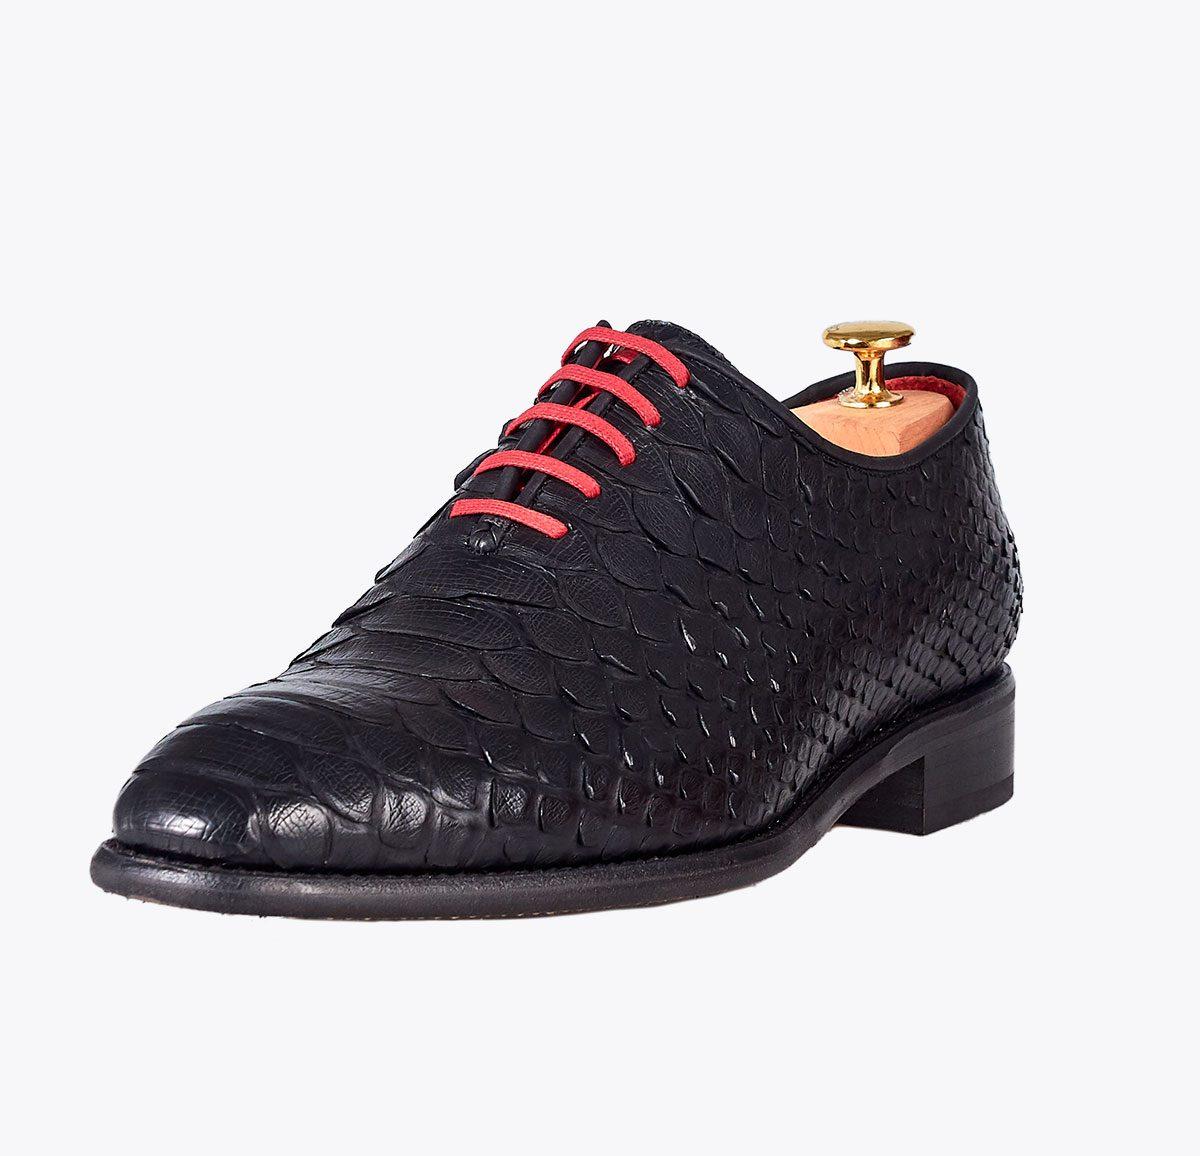 Zapato 0065 pitón negro mate hecho a mano en mandalashoes, Santanyí Mallorca. Hand made shoes. Nach Mass Schuhe